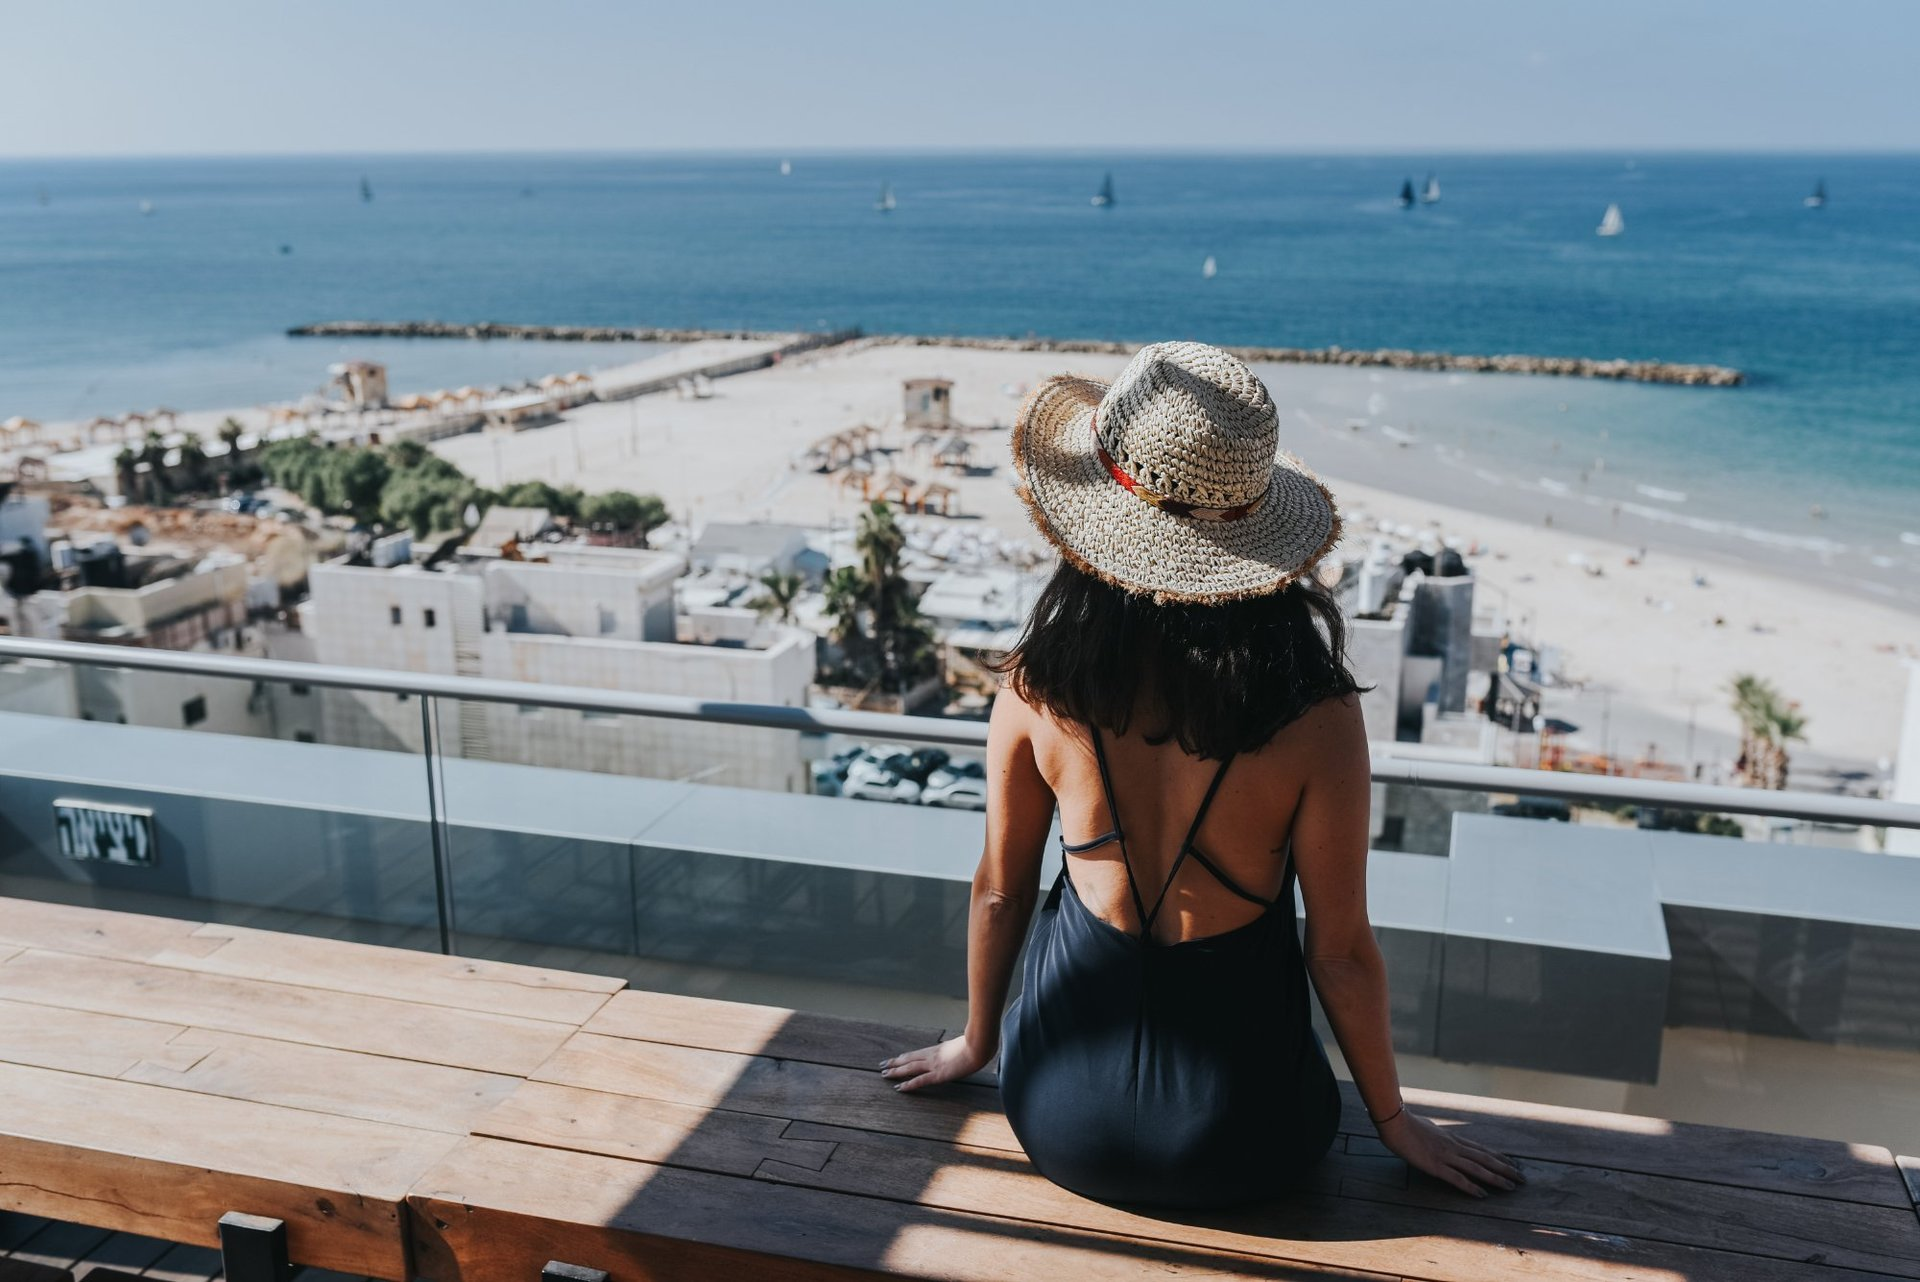 Hotel Tal by the Beach - Tel Aviv